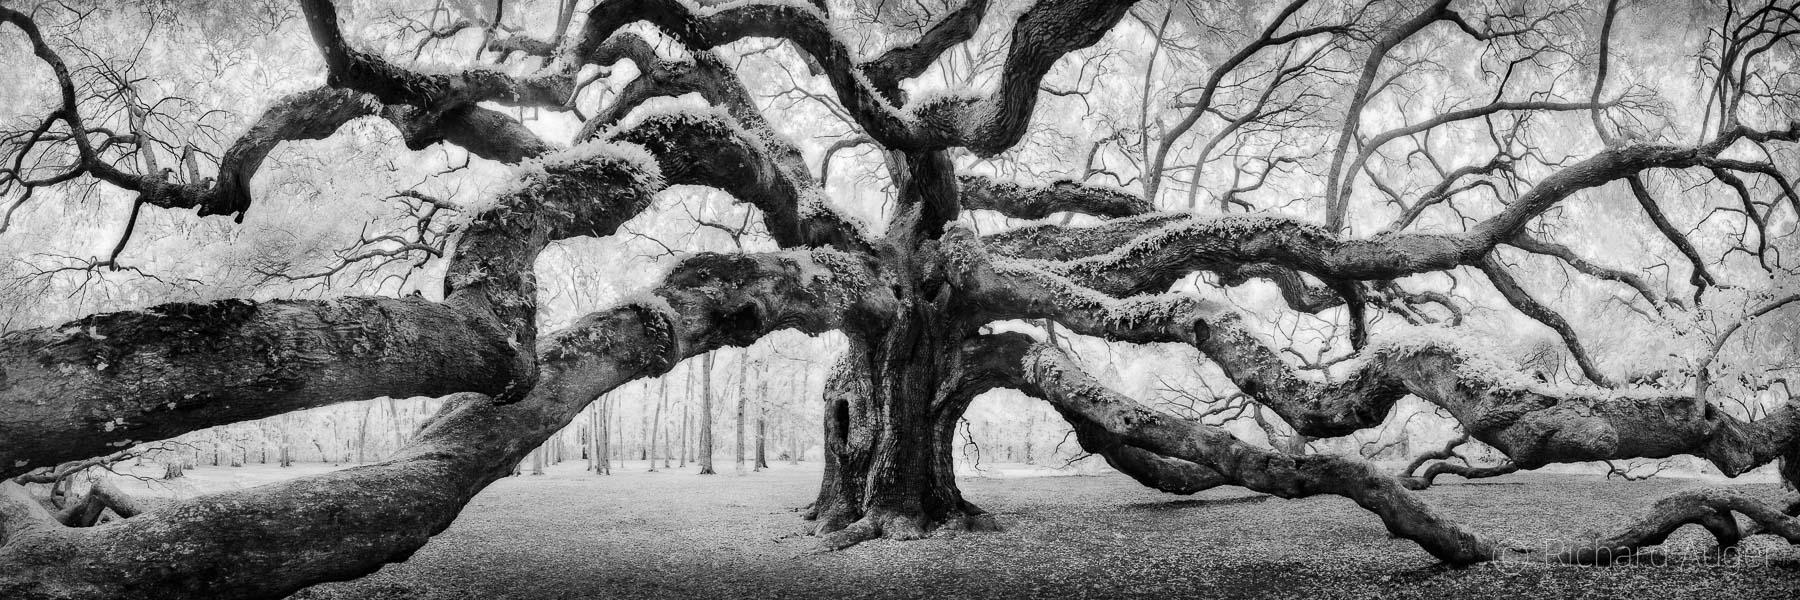 Angel Oak, South Carolina, Oak Tree, Spooky, forest, photographer, landscape, photograph, sepia tone, black and white, panorama